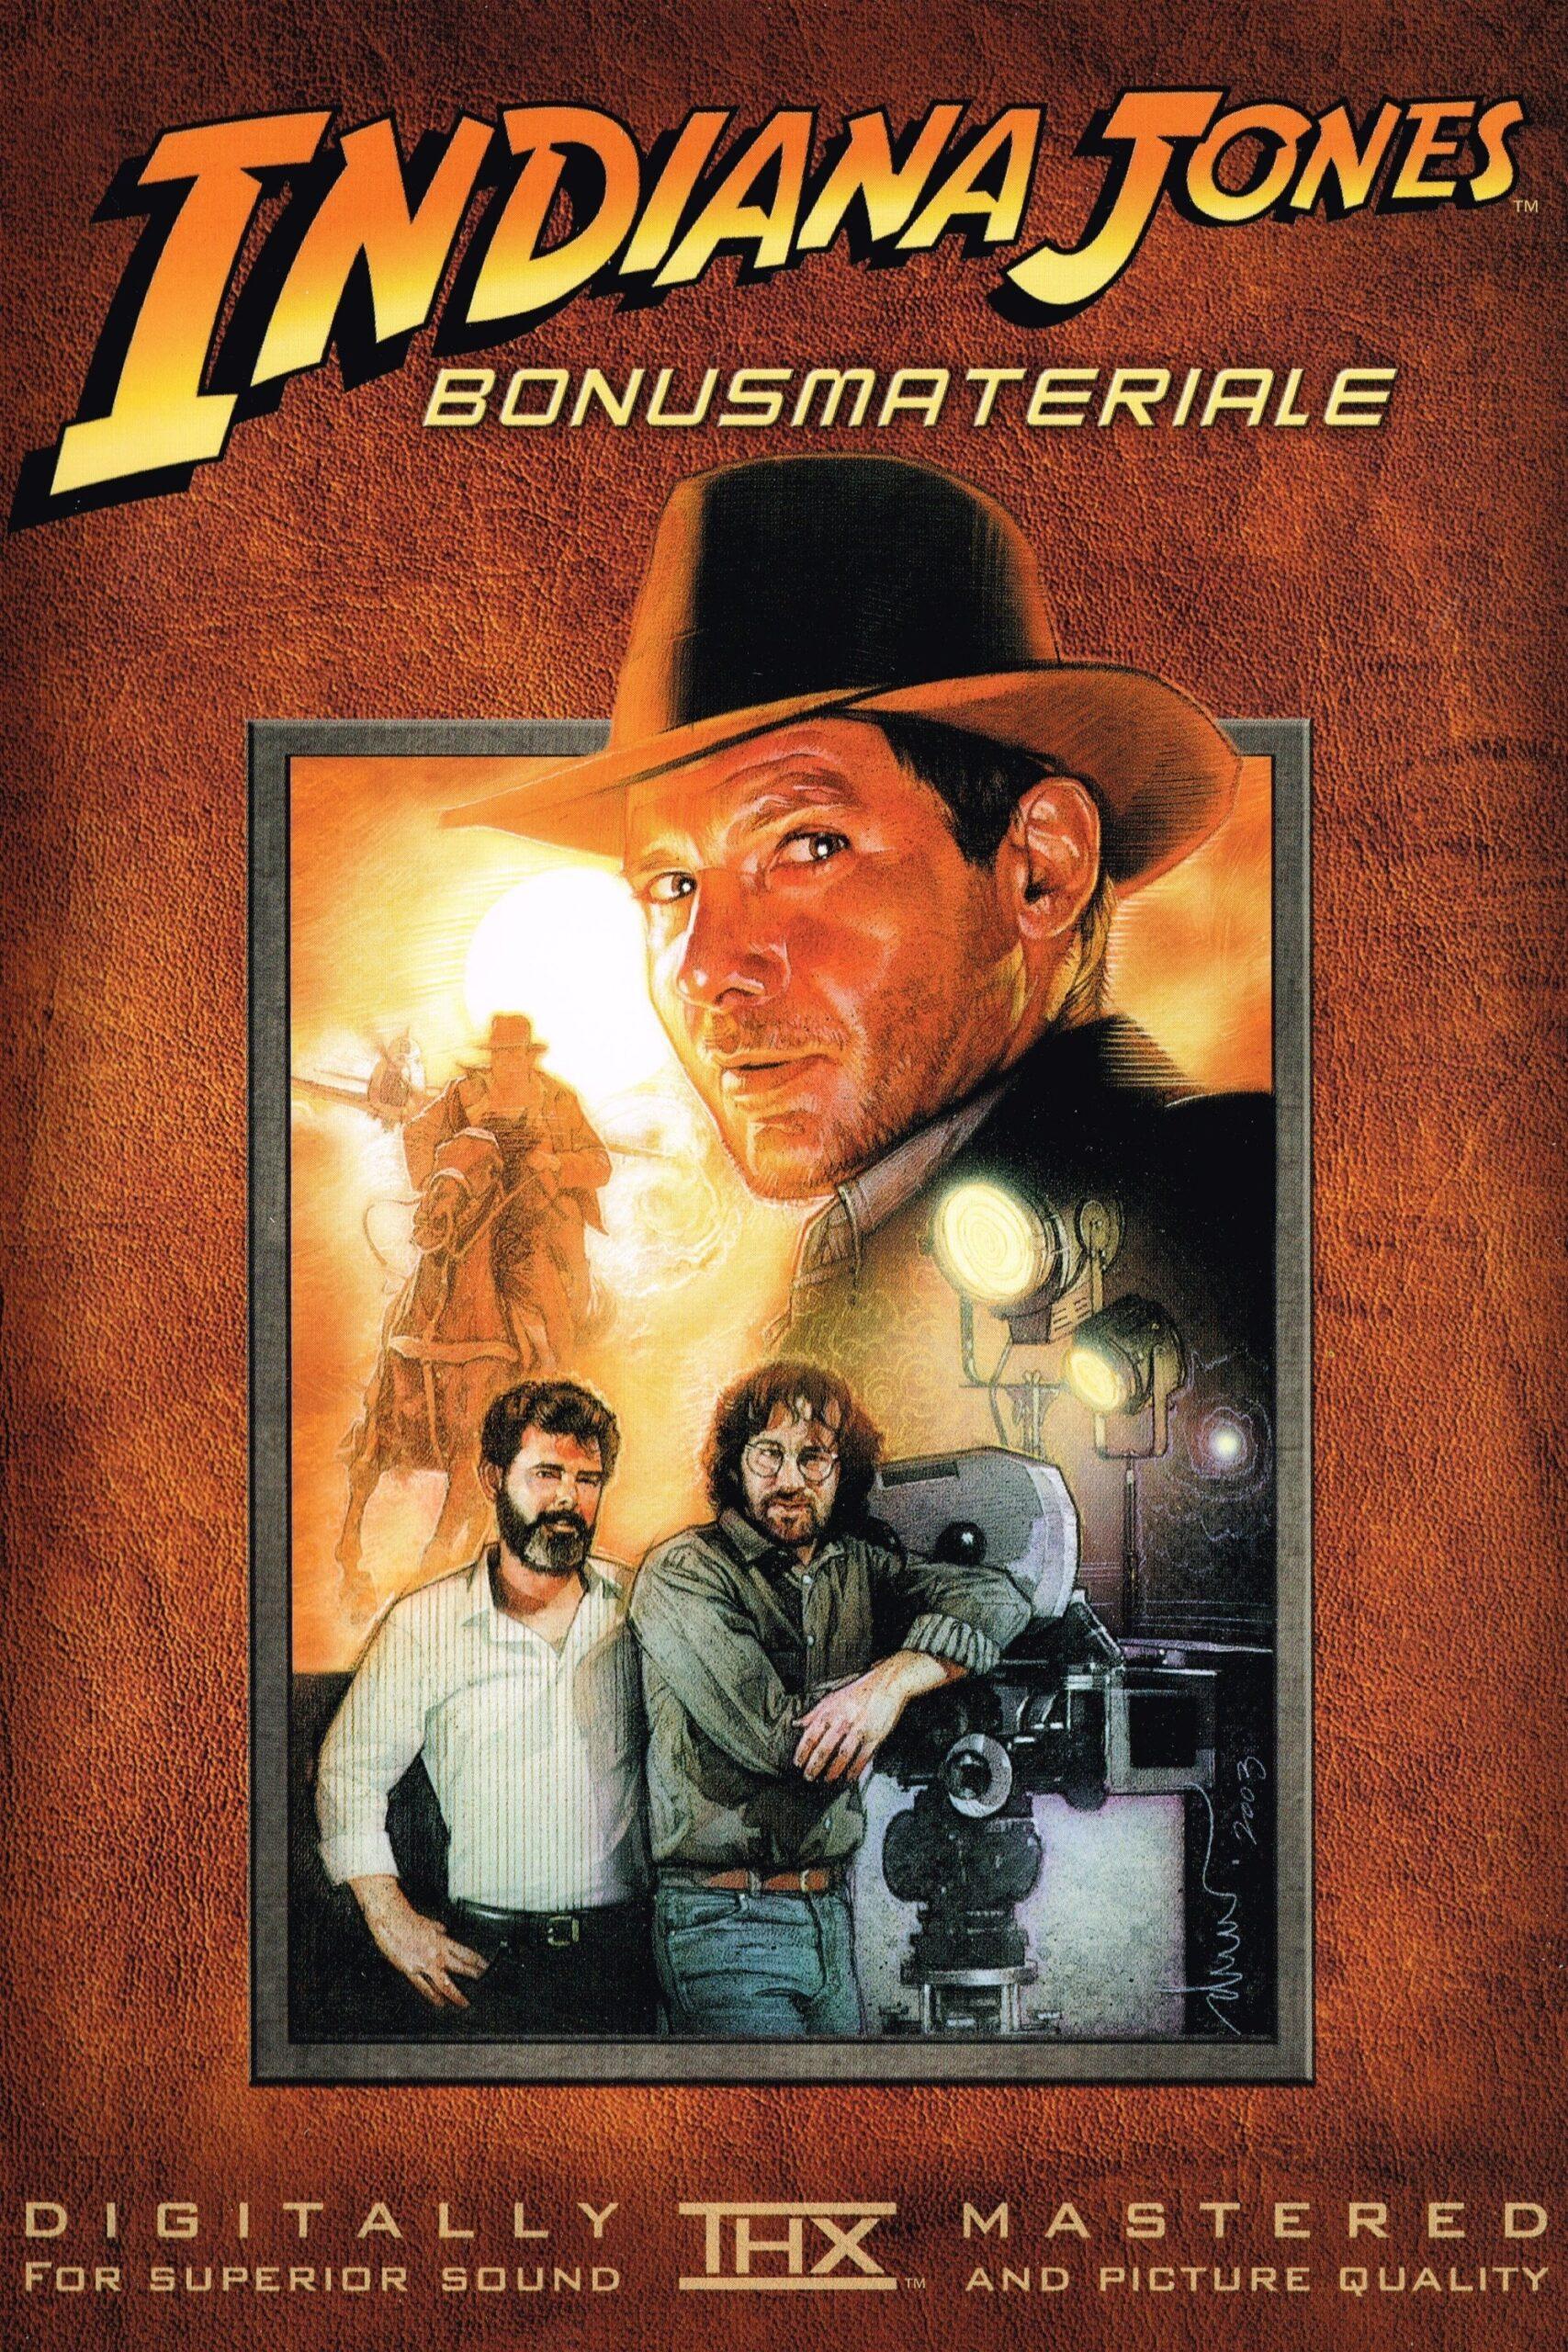 Indiana Jones 3 Streaming : indiana, jones, streaming, Indiana, Jones:, Making, Trilogy, Movie, Streaming, Online, Watch